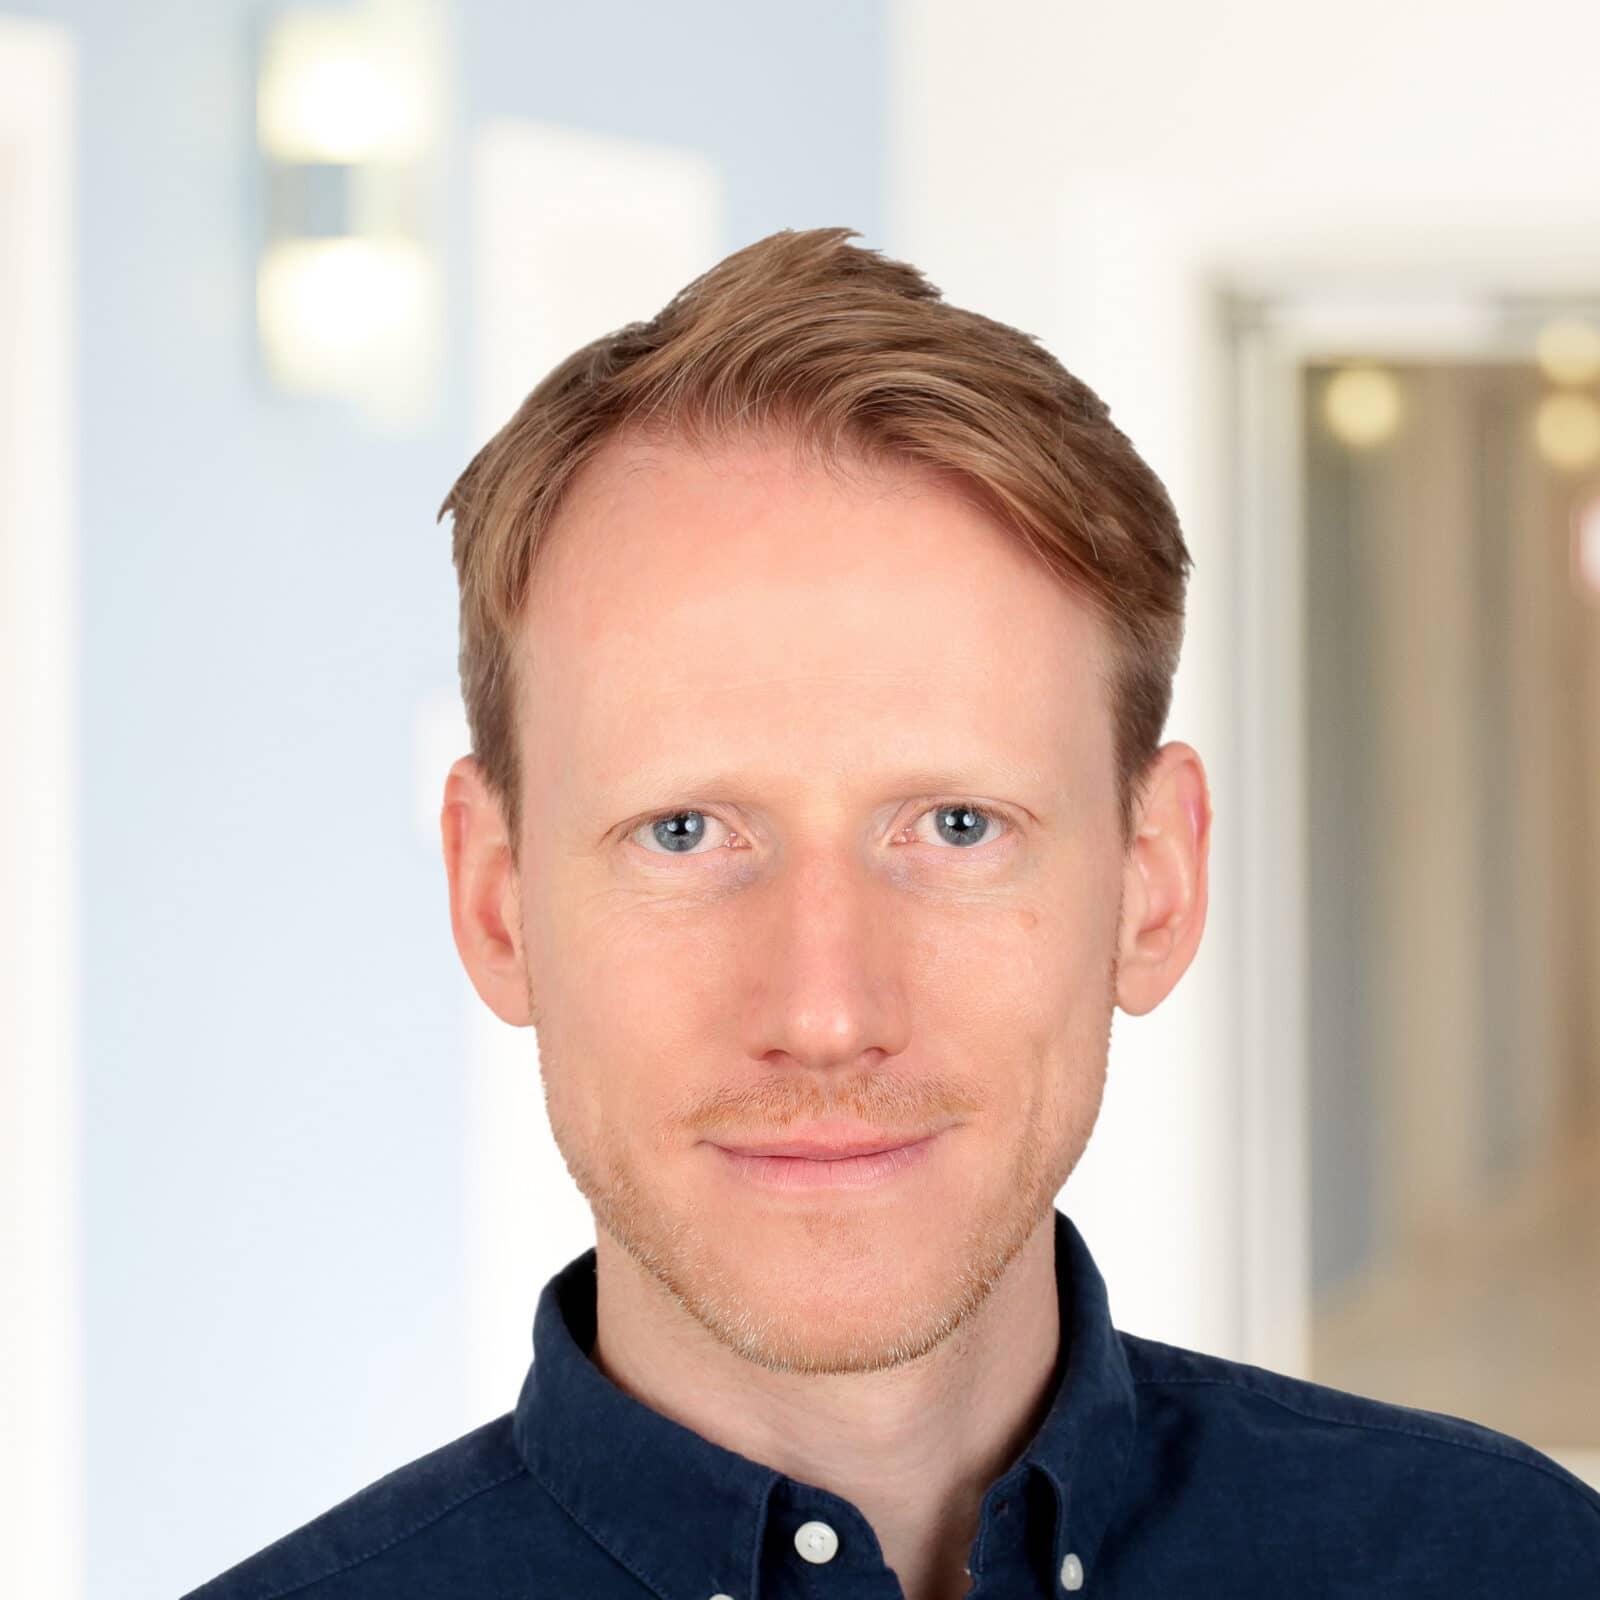 JProf. Michael J. Böhm, PhD